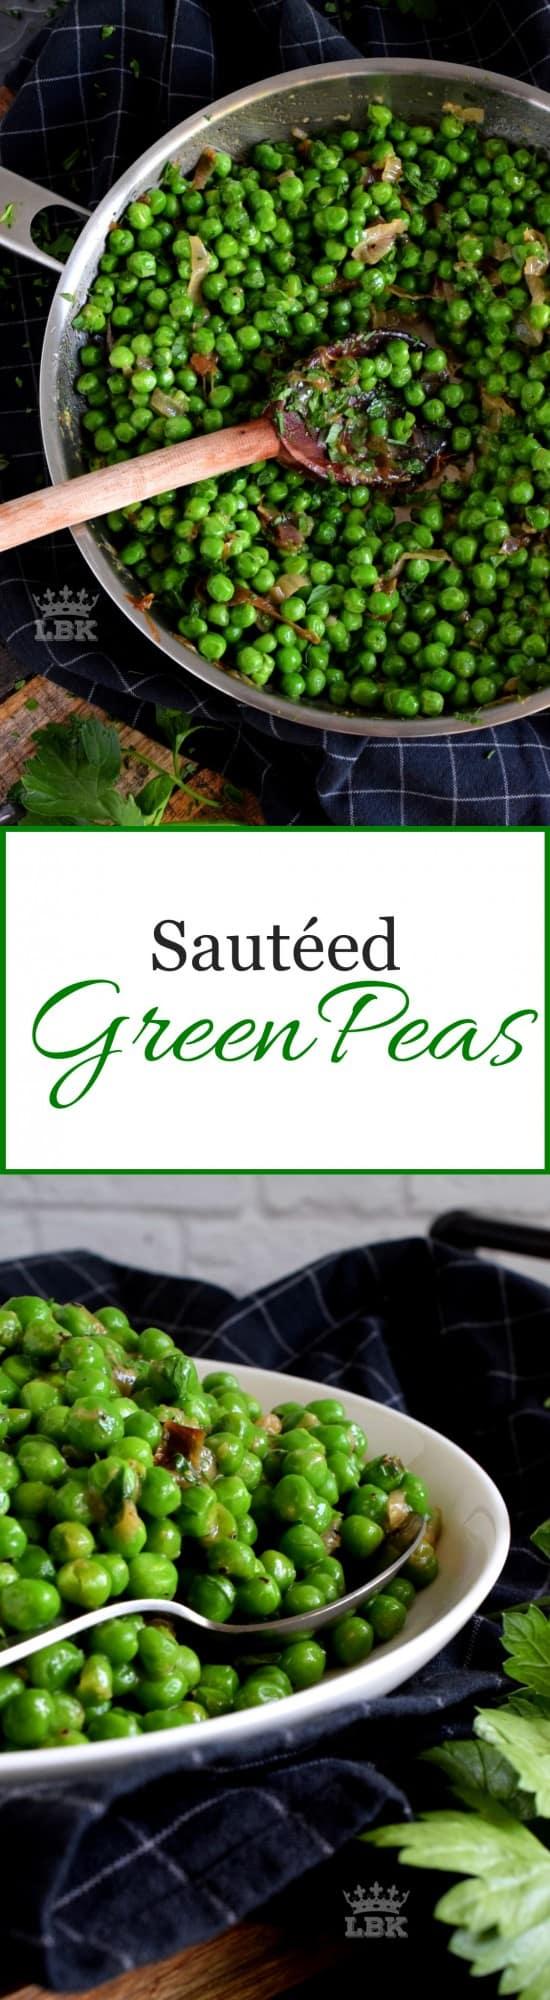 Sauteed Green Peas